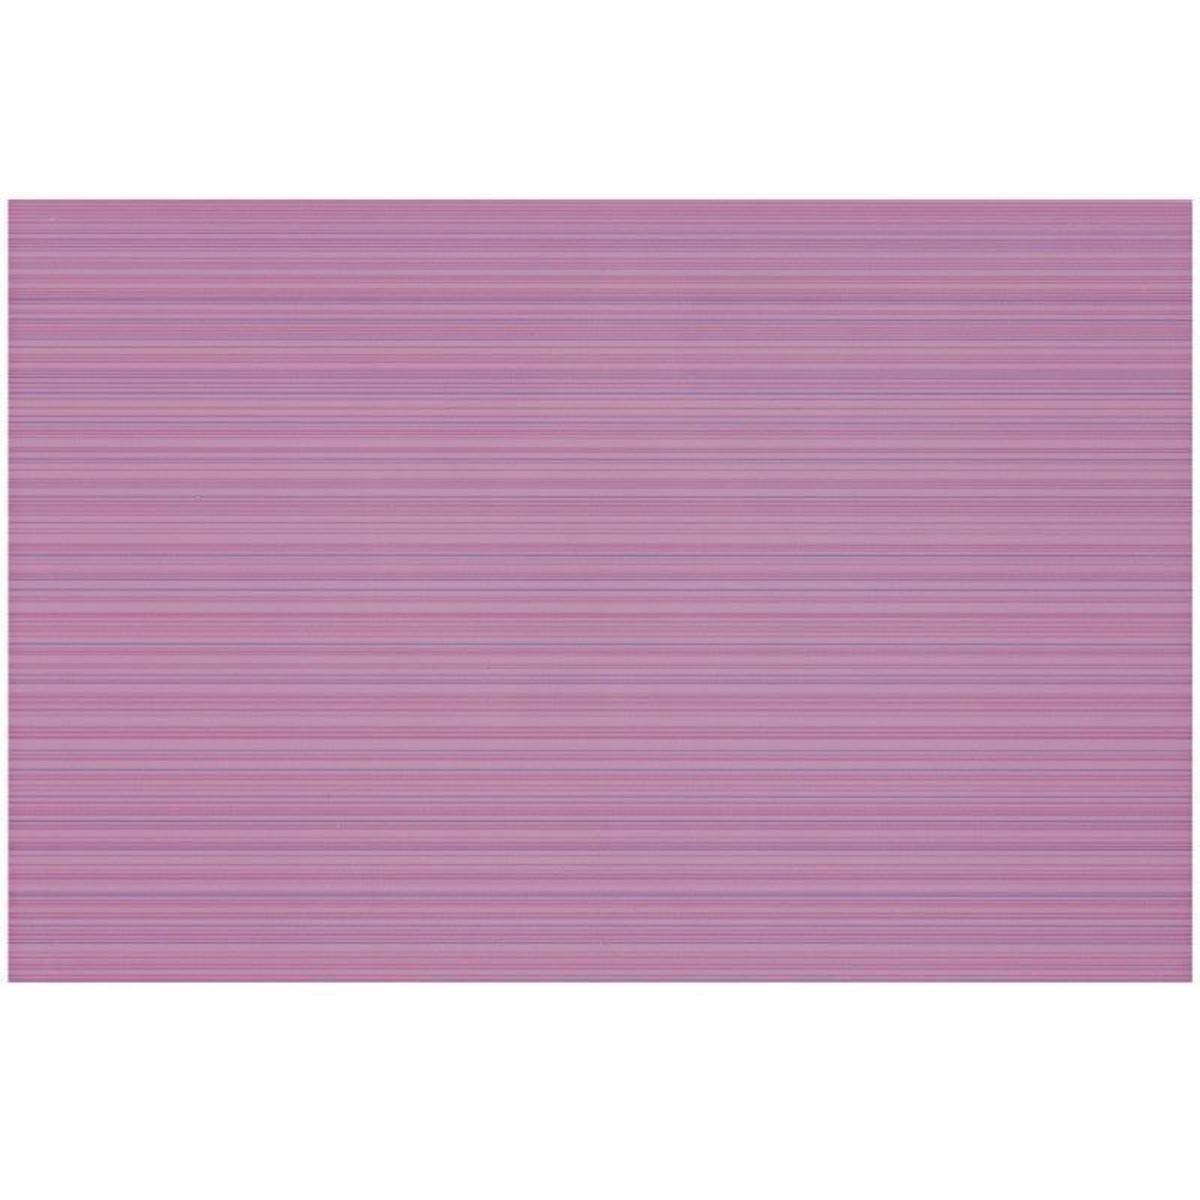 Плитка настенная Дельта 30х20 см 1.44 м² цвет розовый